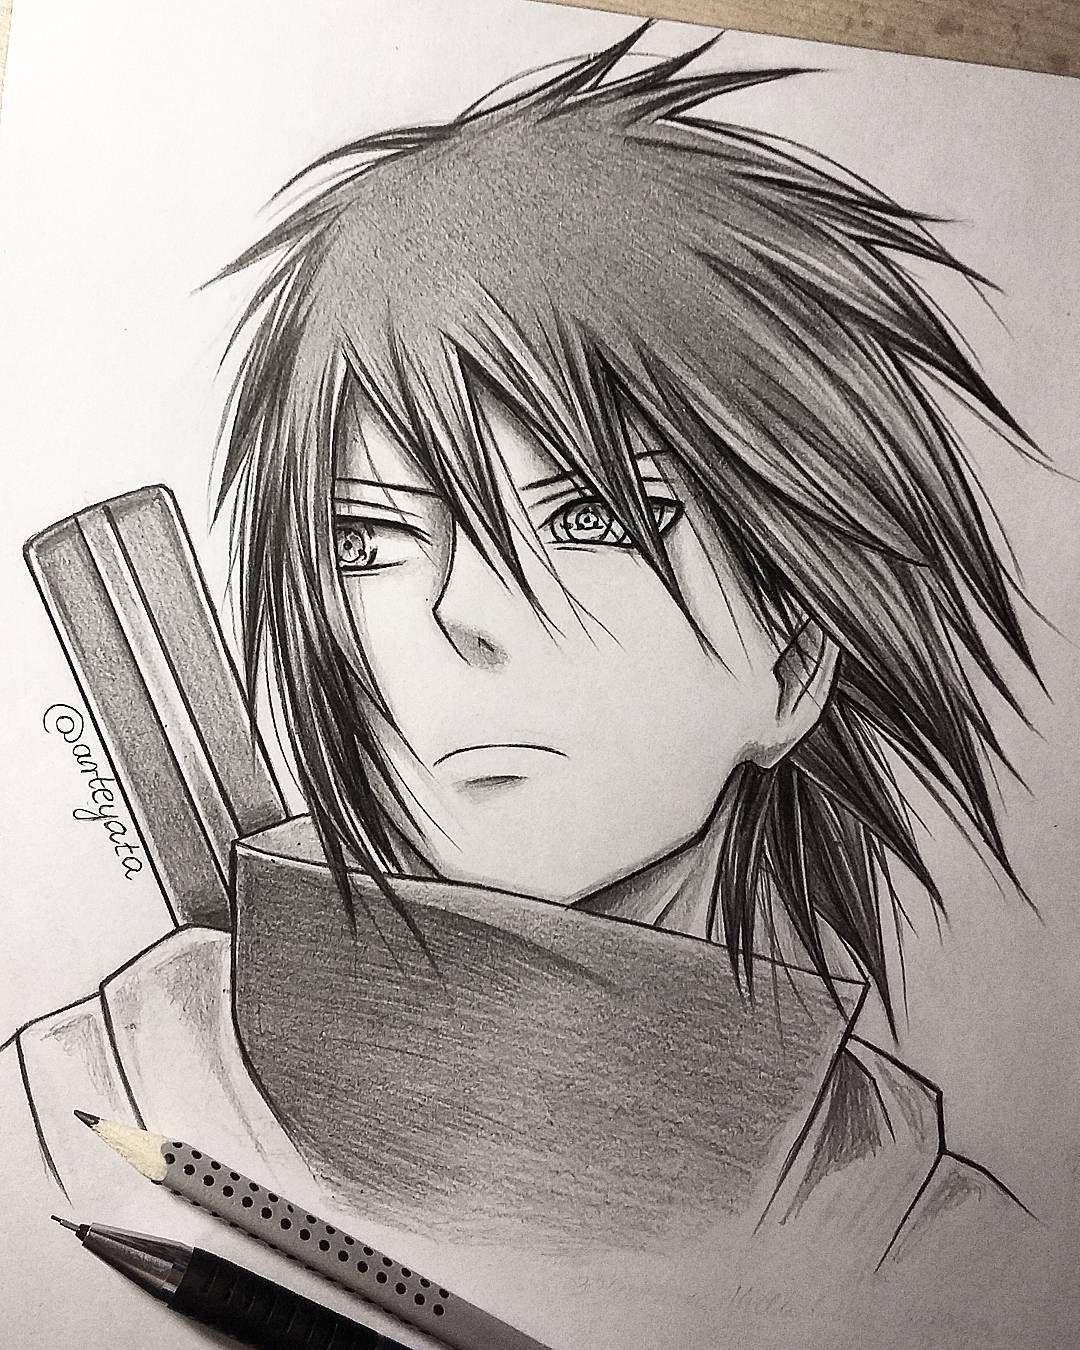 Top 10 Weakest to Strongest Uchiha in order Naruto